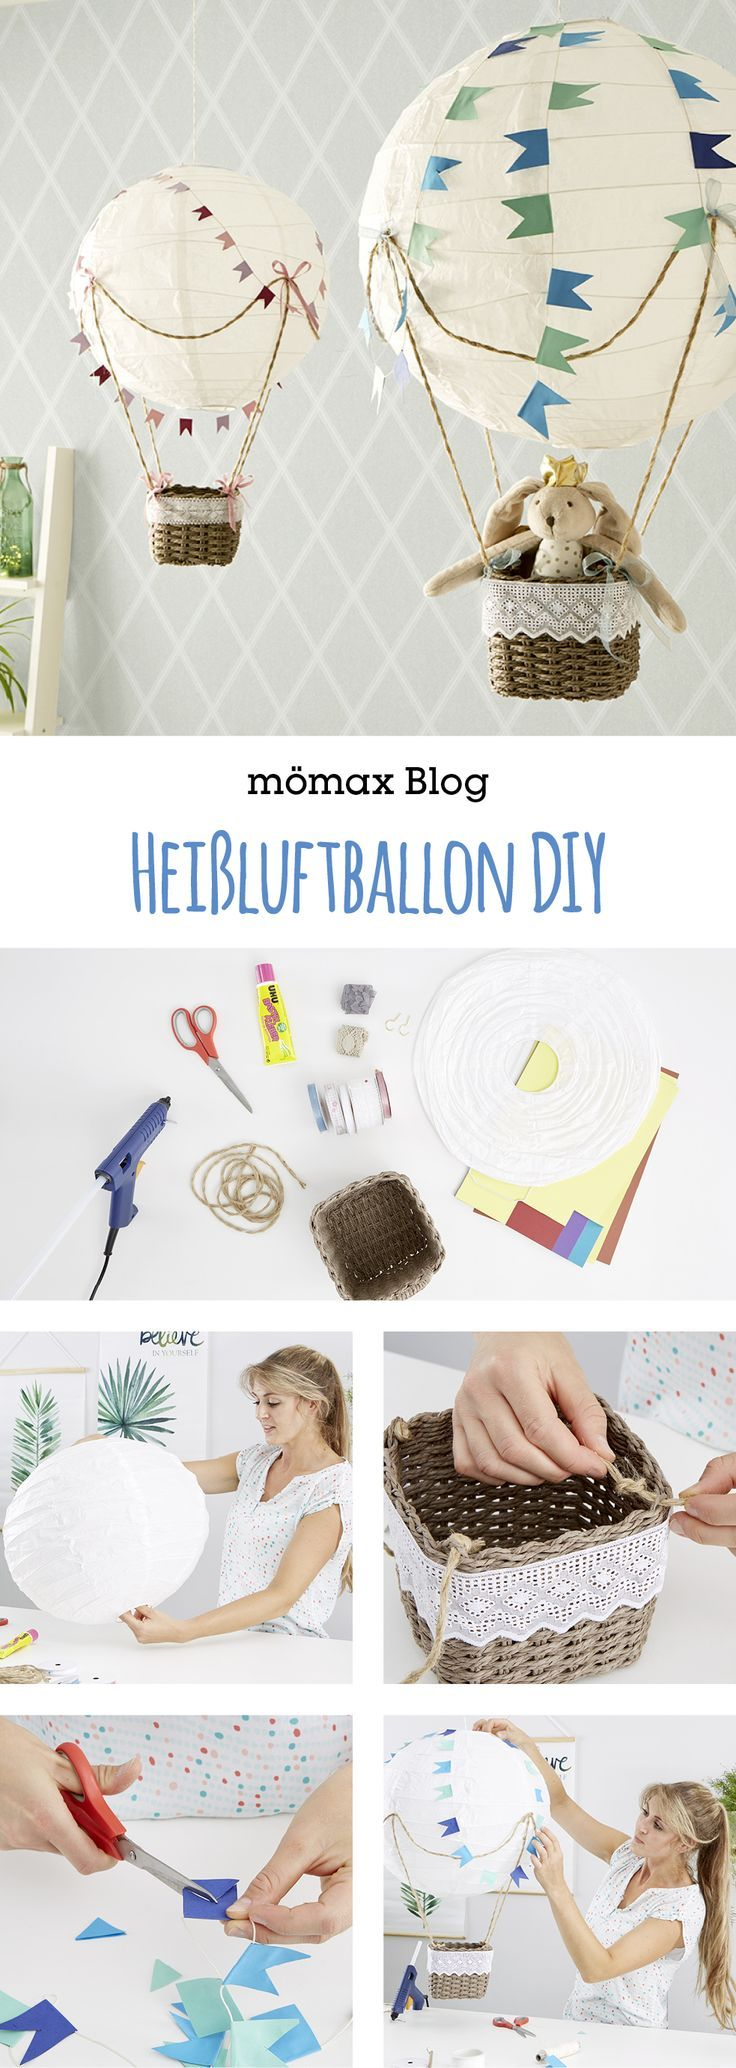 Heißluftballon für's Kinderzimmer DIY Kinder zimmer